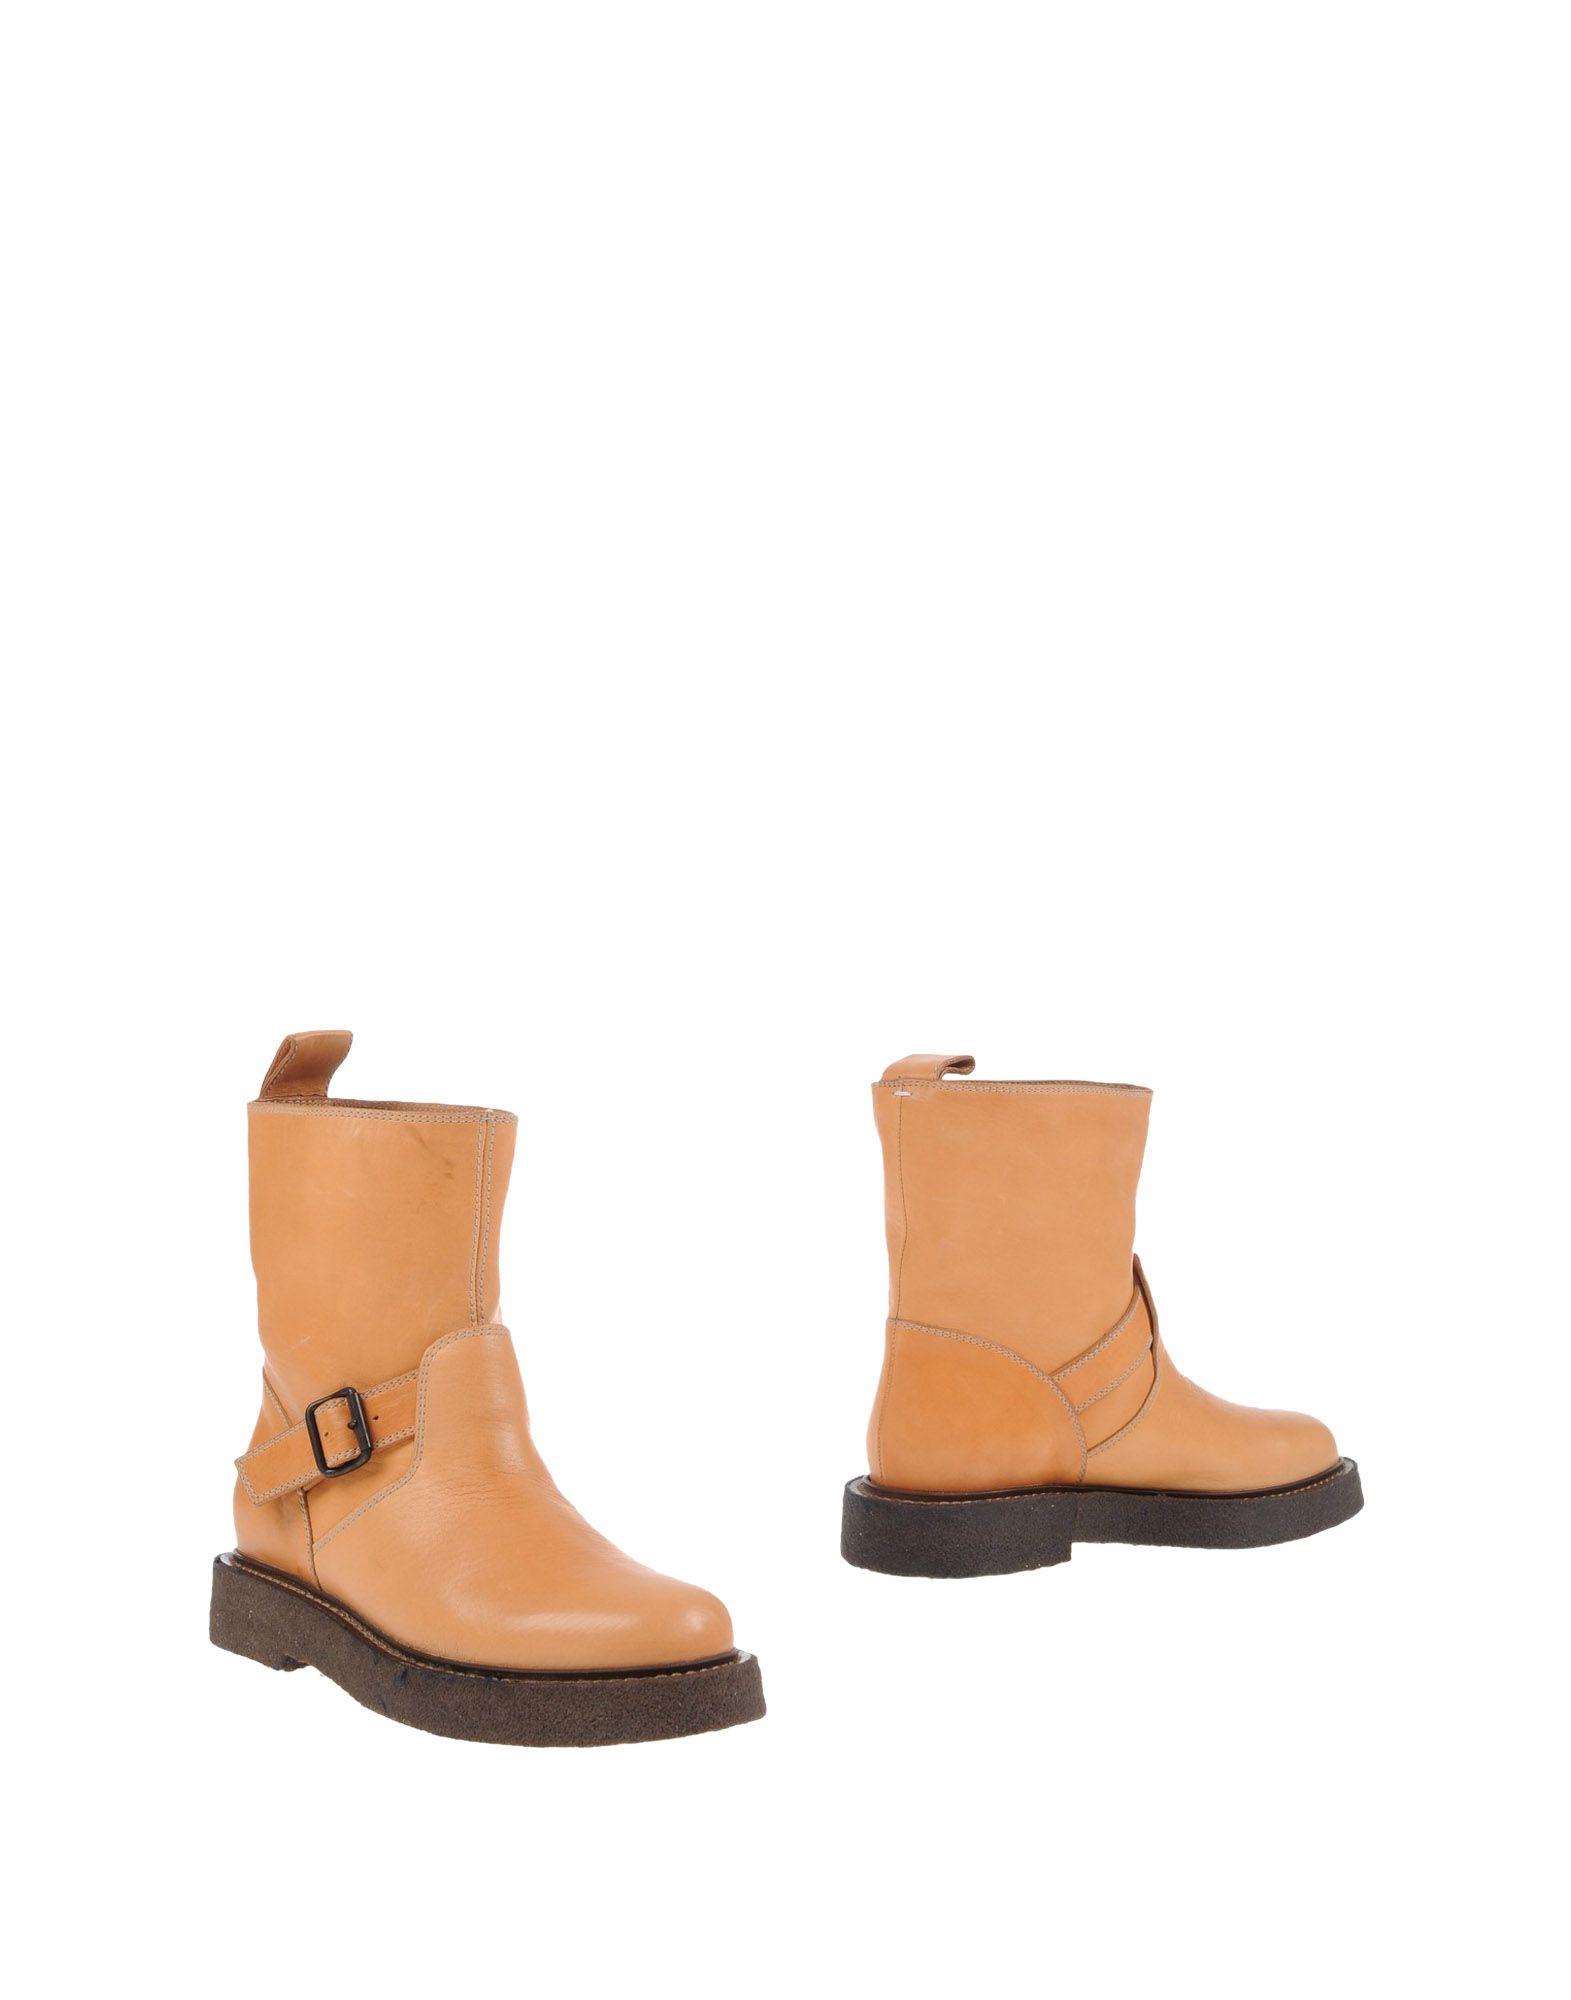 MAISON MARGIELA Полусапоги и высокие ботинки maison margiela ботинки